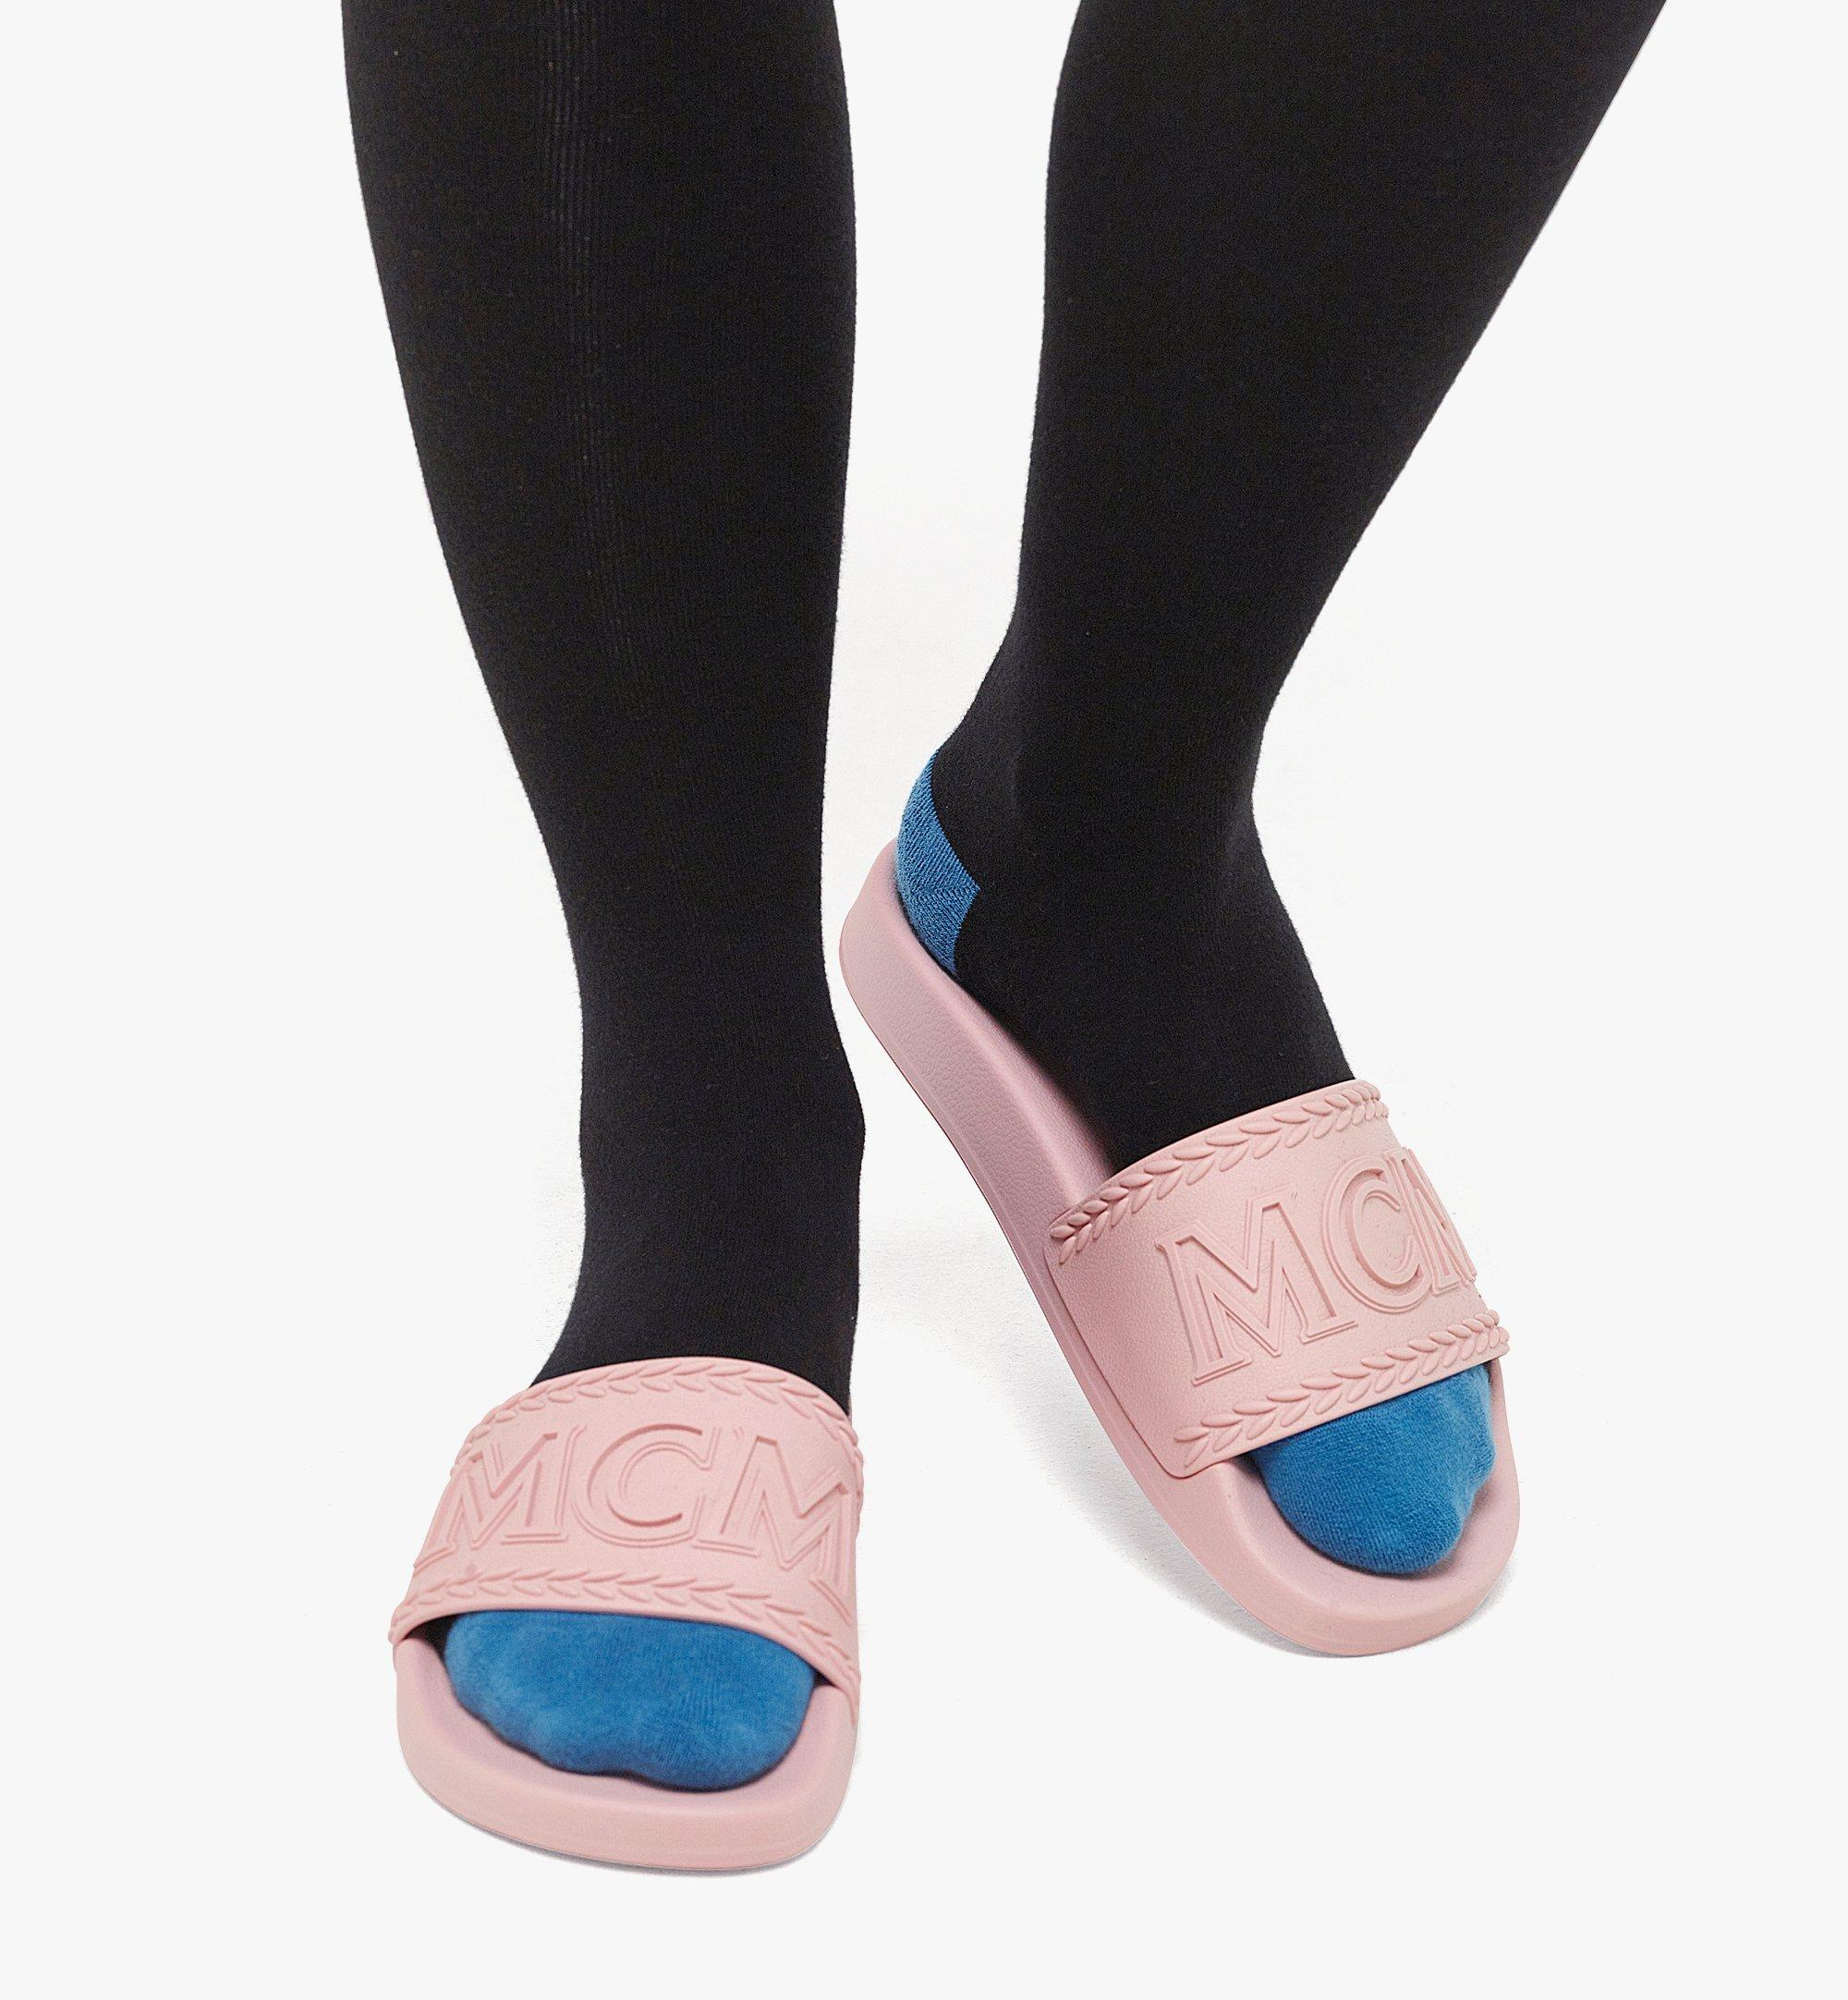 MCM 女士Big Logo橡胶拖鞋 Pink MESBSMM15QH035 更多视角 2